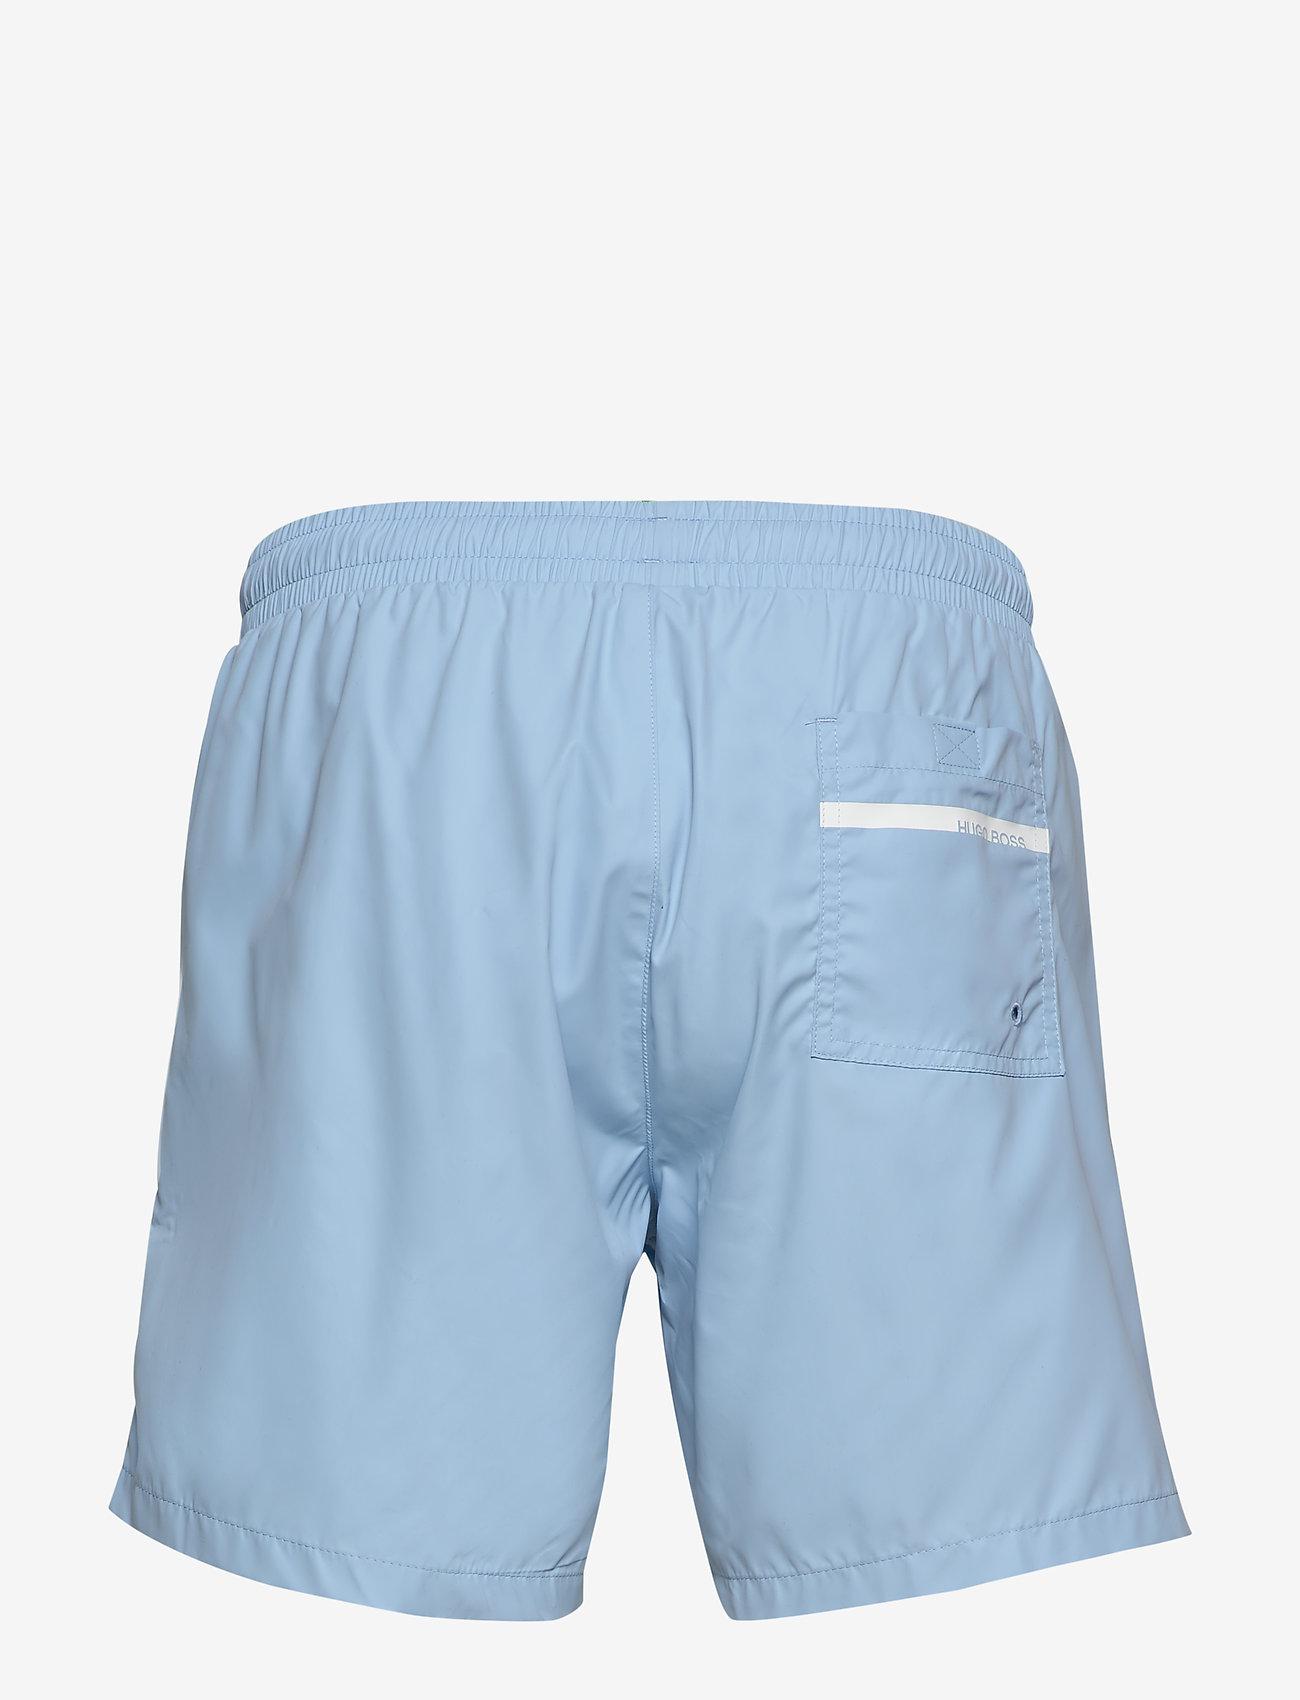 BOSS - Dolphin - badebukser - light/pastel blue - 1